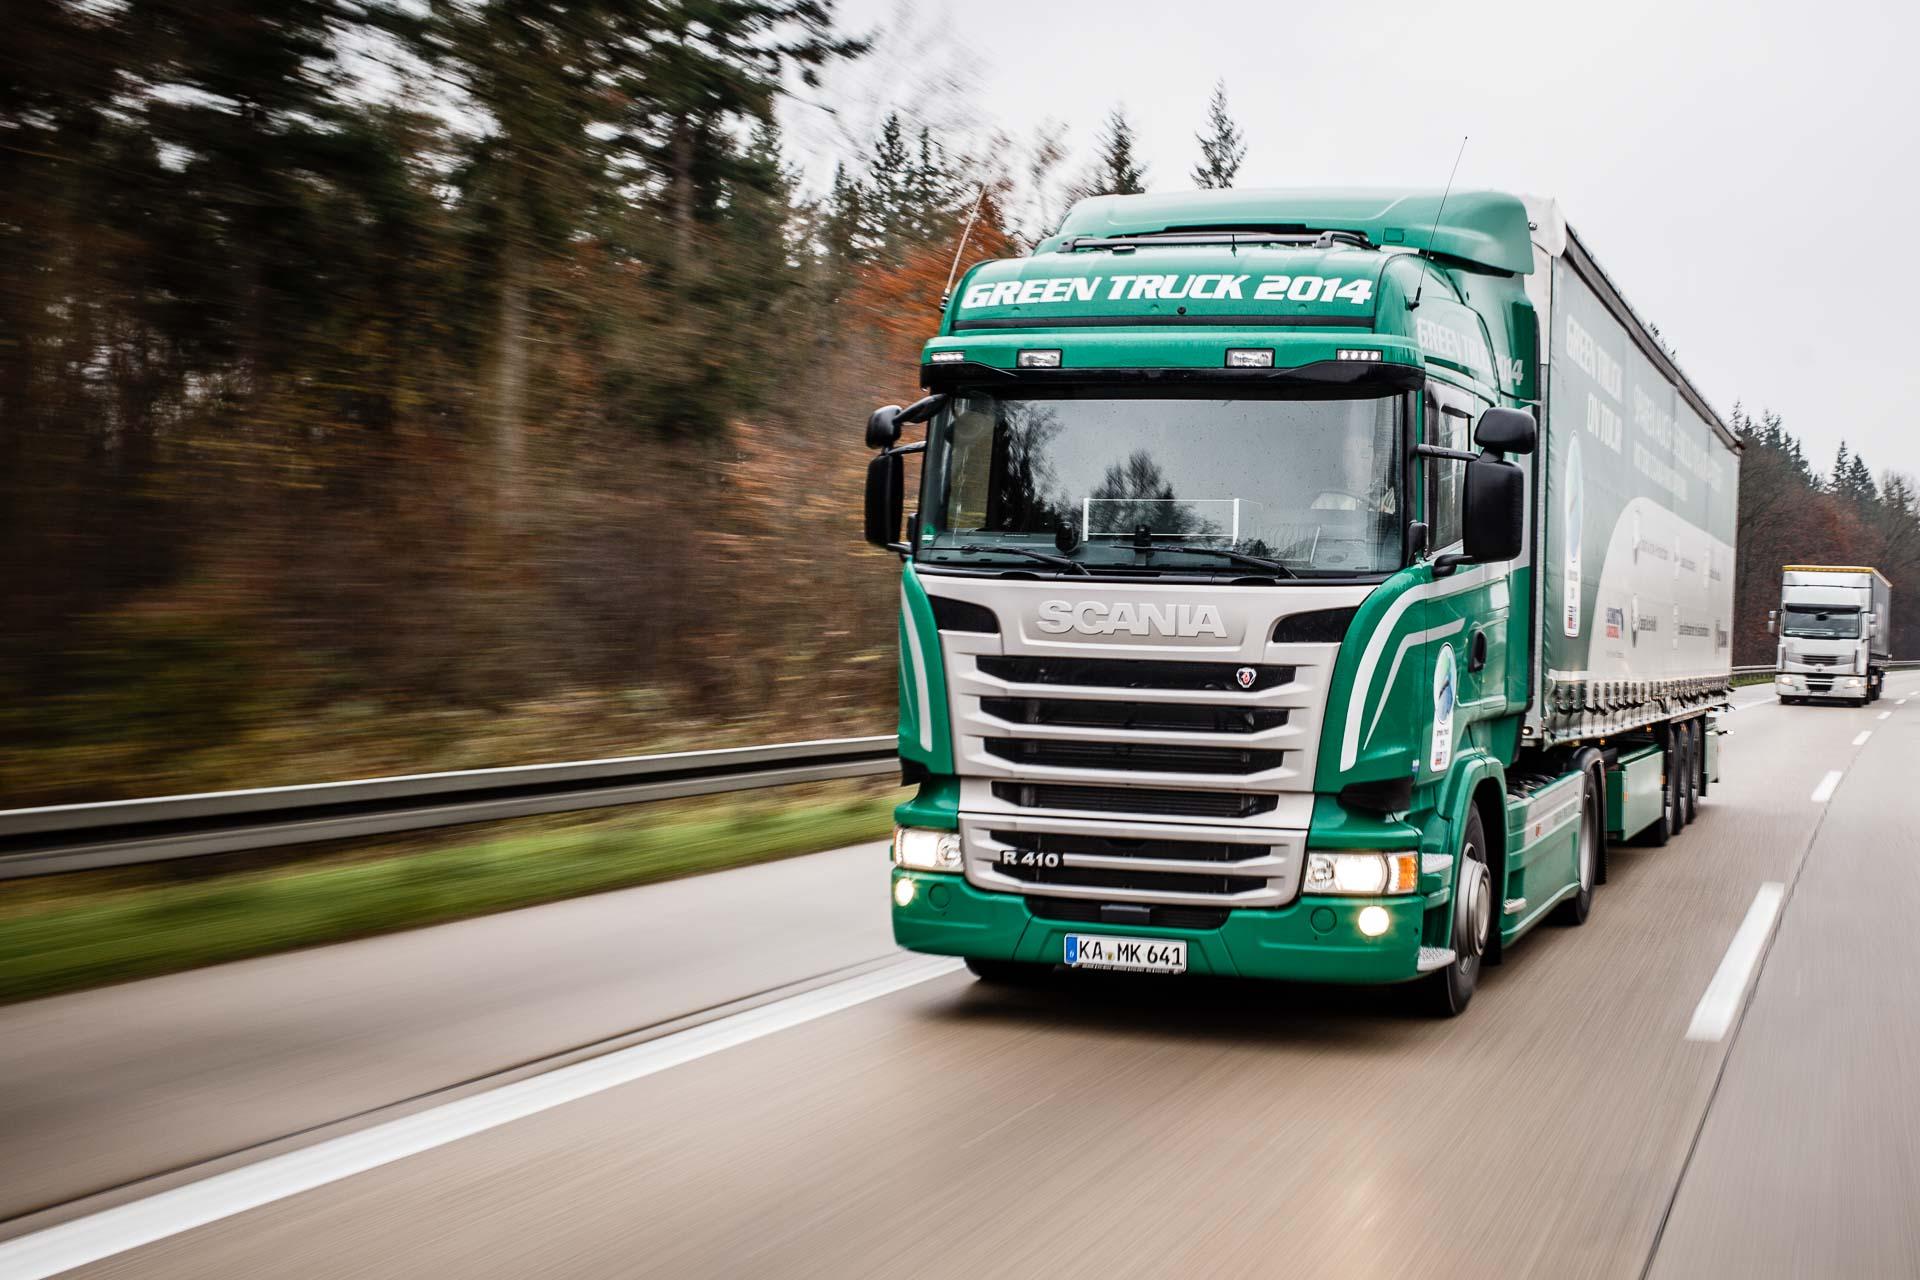 Scania Green Truck 2017